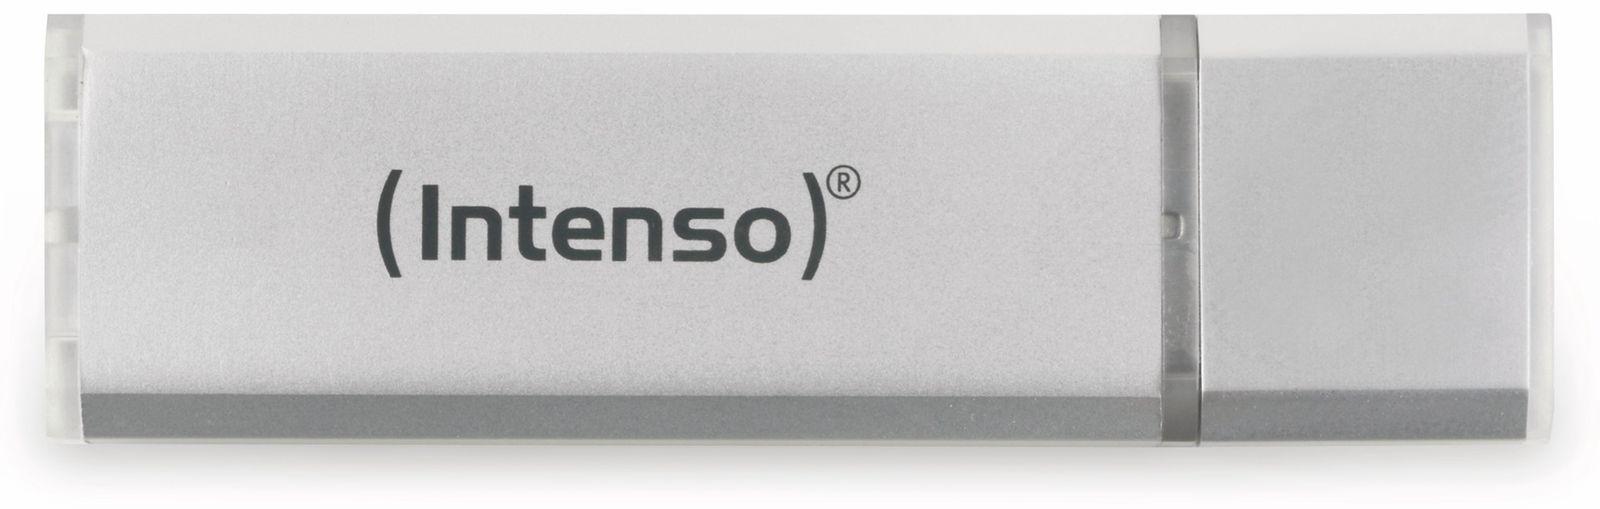 Intenso USB2.0 Stick, 32GB, silber, Alu INTENSO ALU LINE